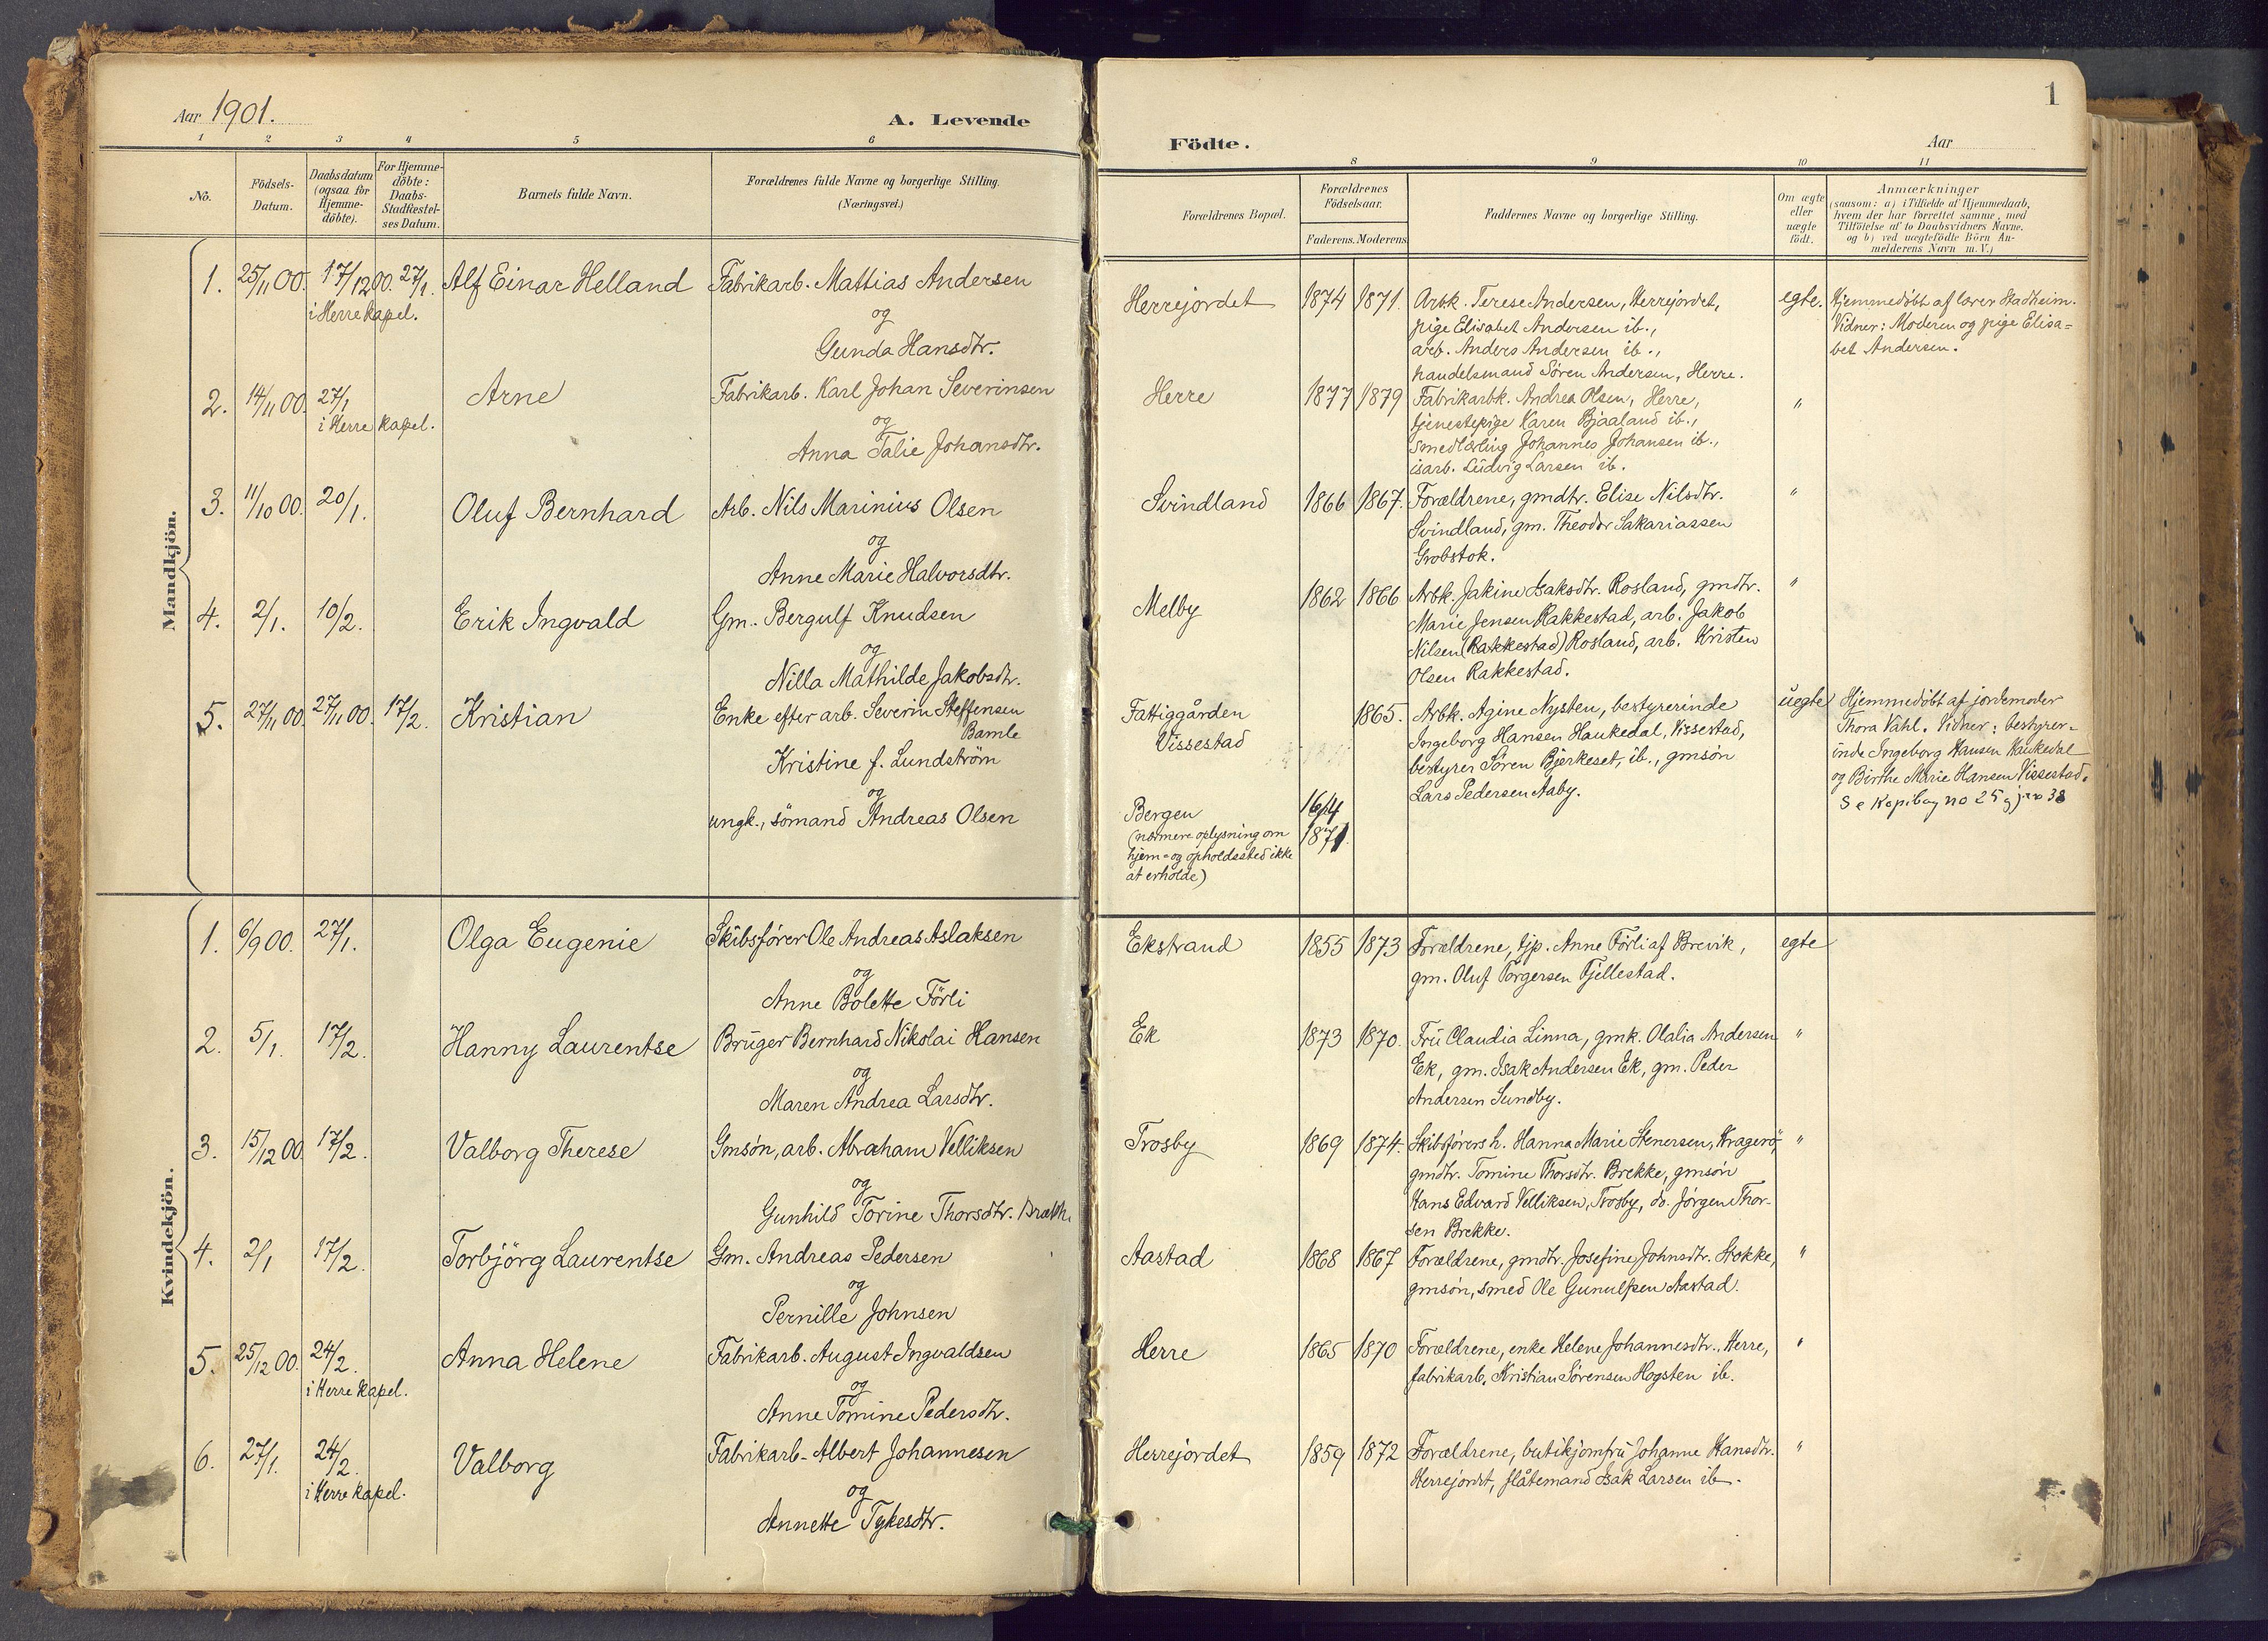 SAKO, Bamble kirkebøker, F/Fa/L0009: Ministerialbok nr. I 9, 1901-1917, s. 1